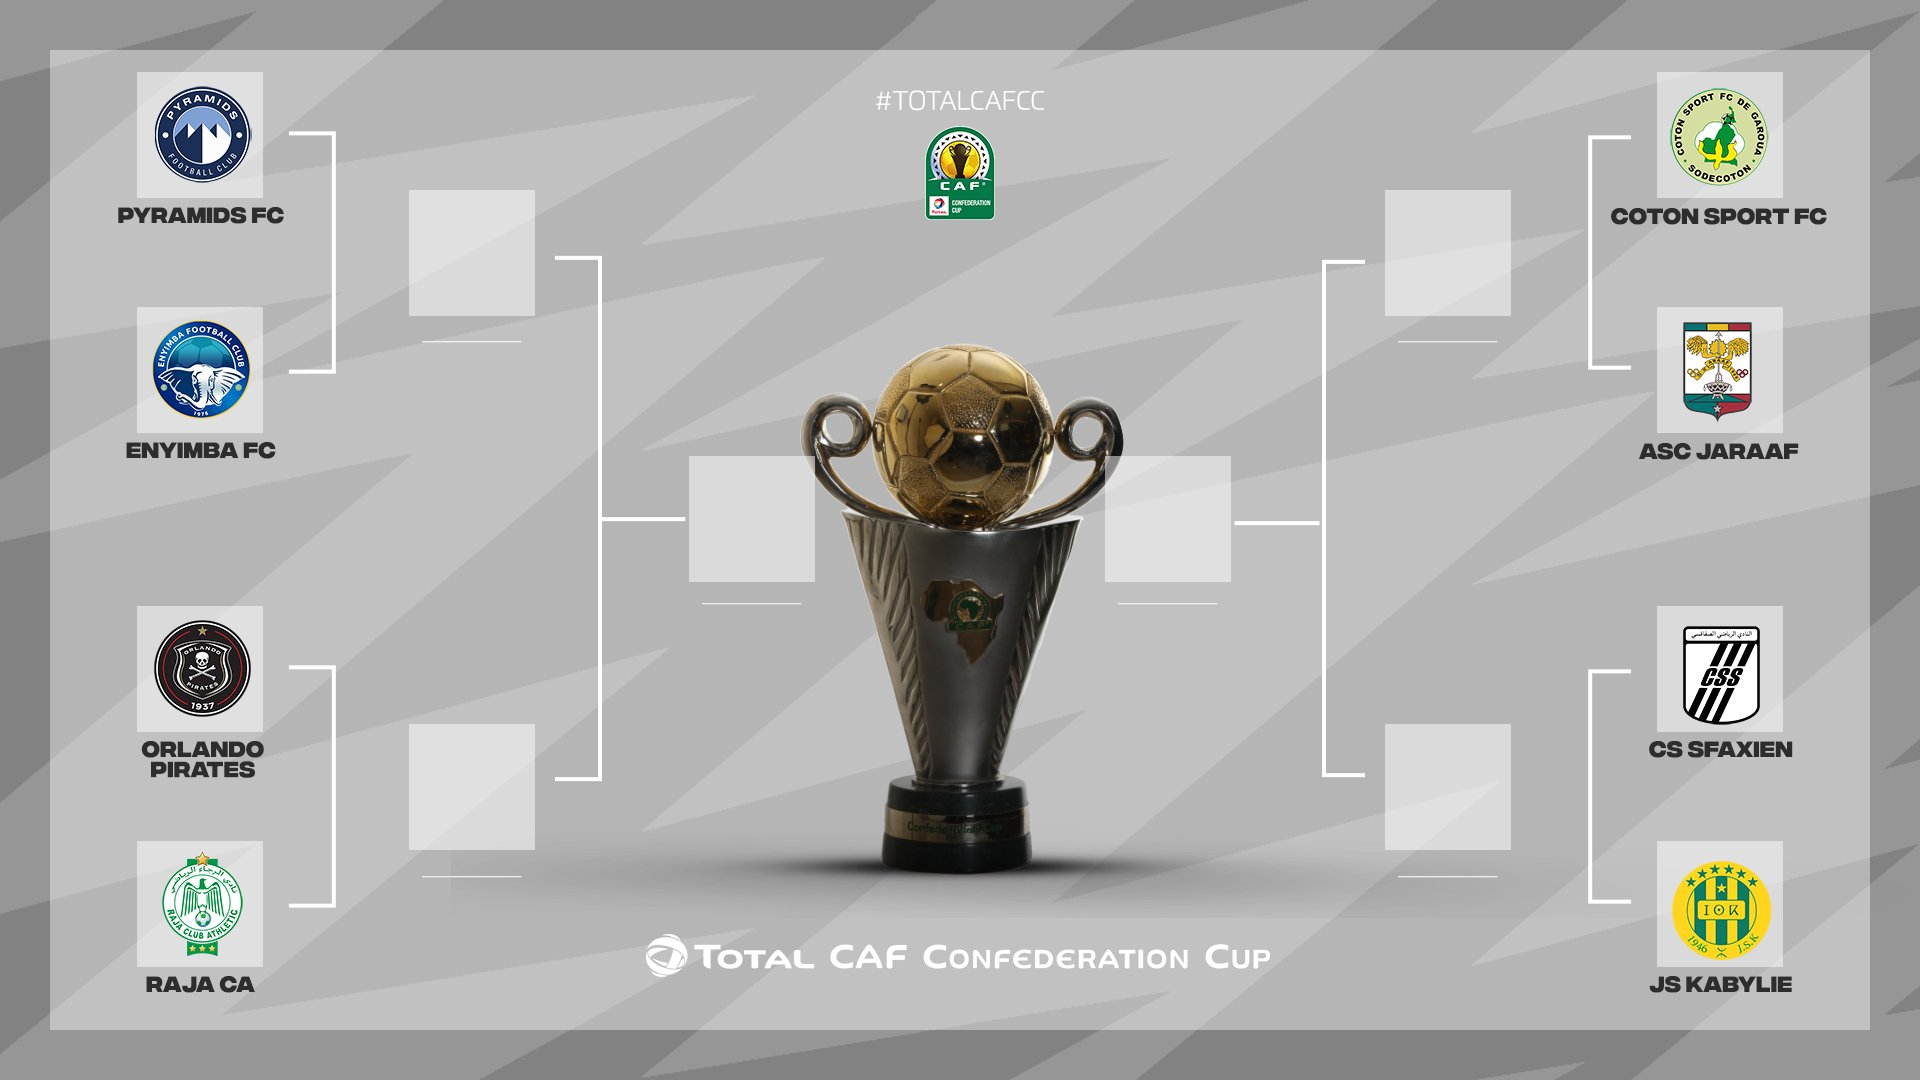 CAFCC Quarter/Final Draw: Enyimba To Face Egyptian Club Pyramids FC